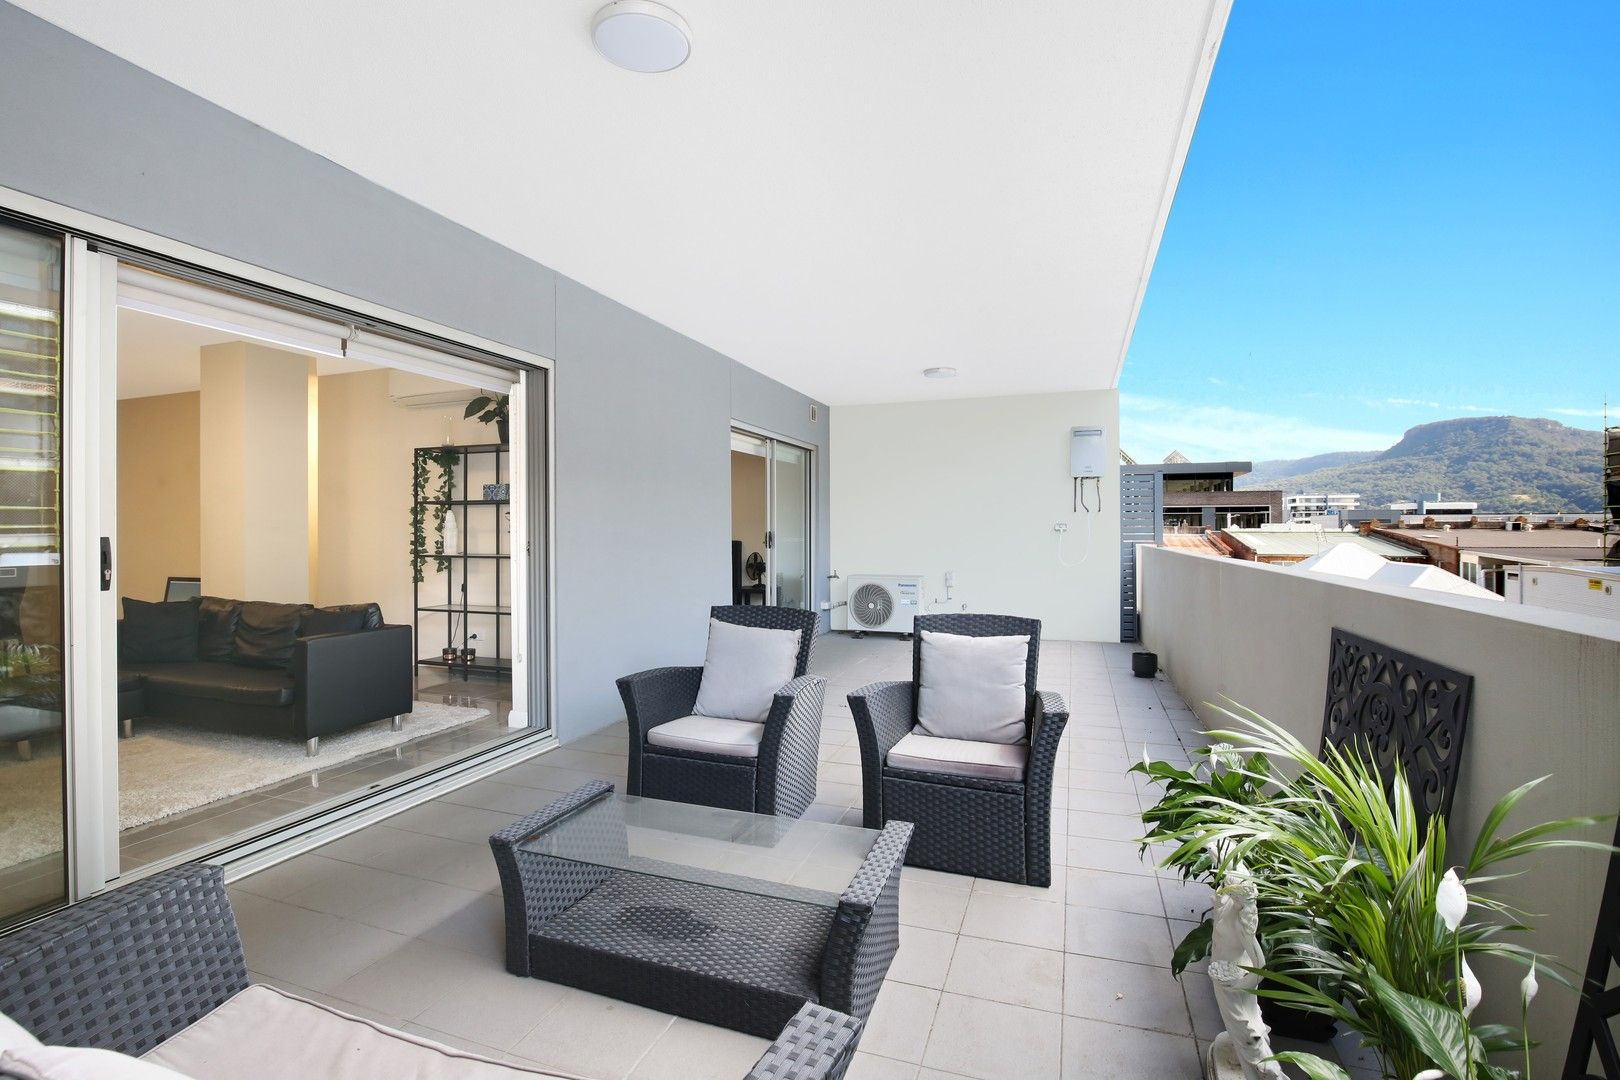 2/10 Thomas  Street, Wollongong NSW 2500, Image 0